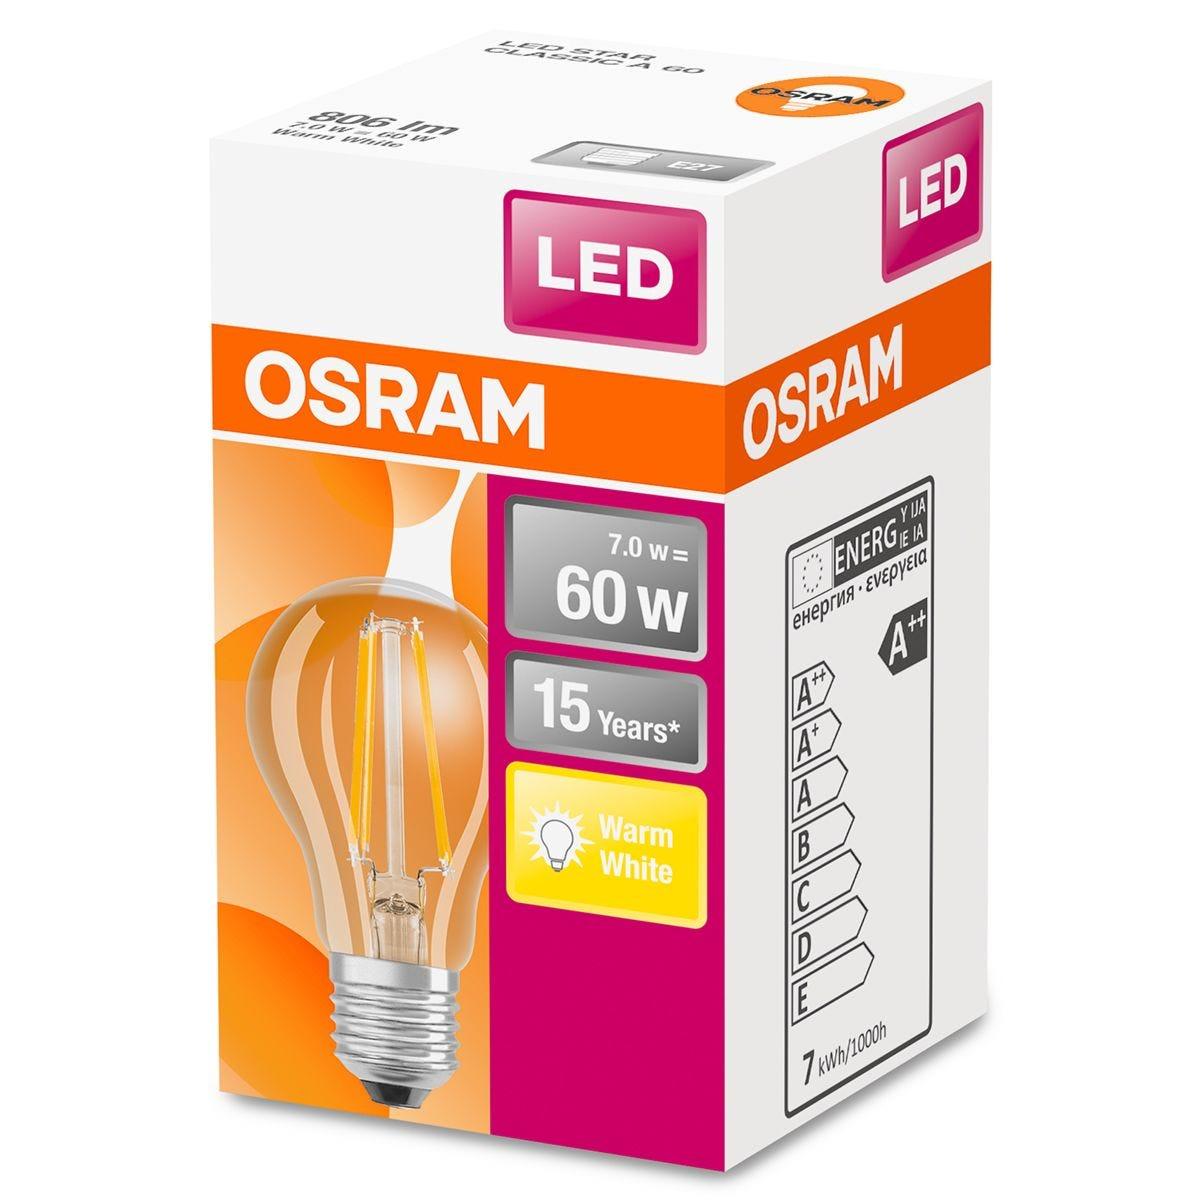 Osram 60W Classic A Filament ES LED Bulb - Warm White